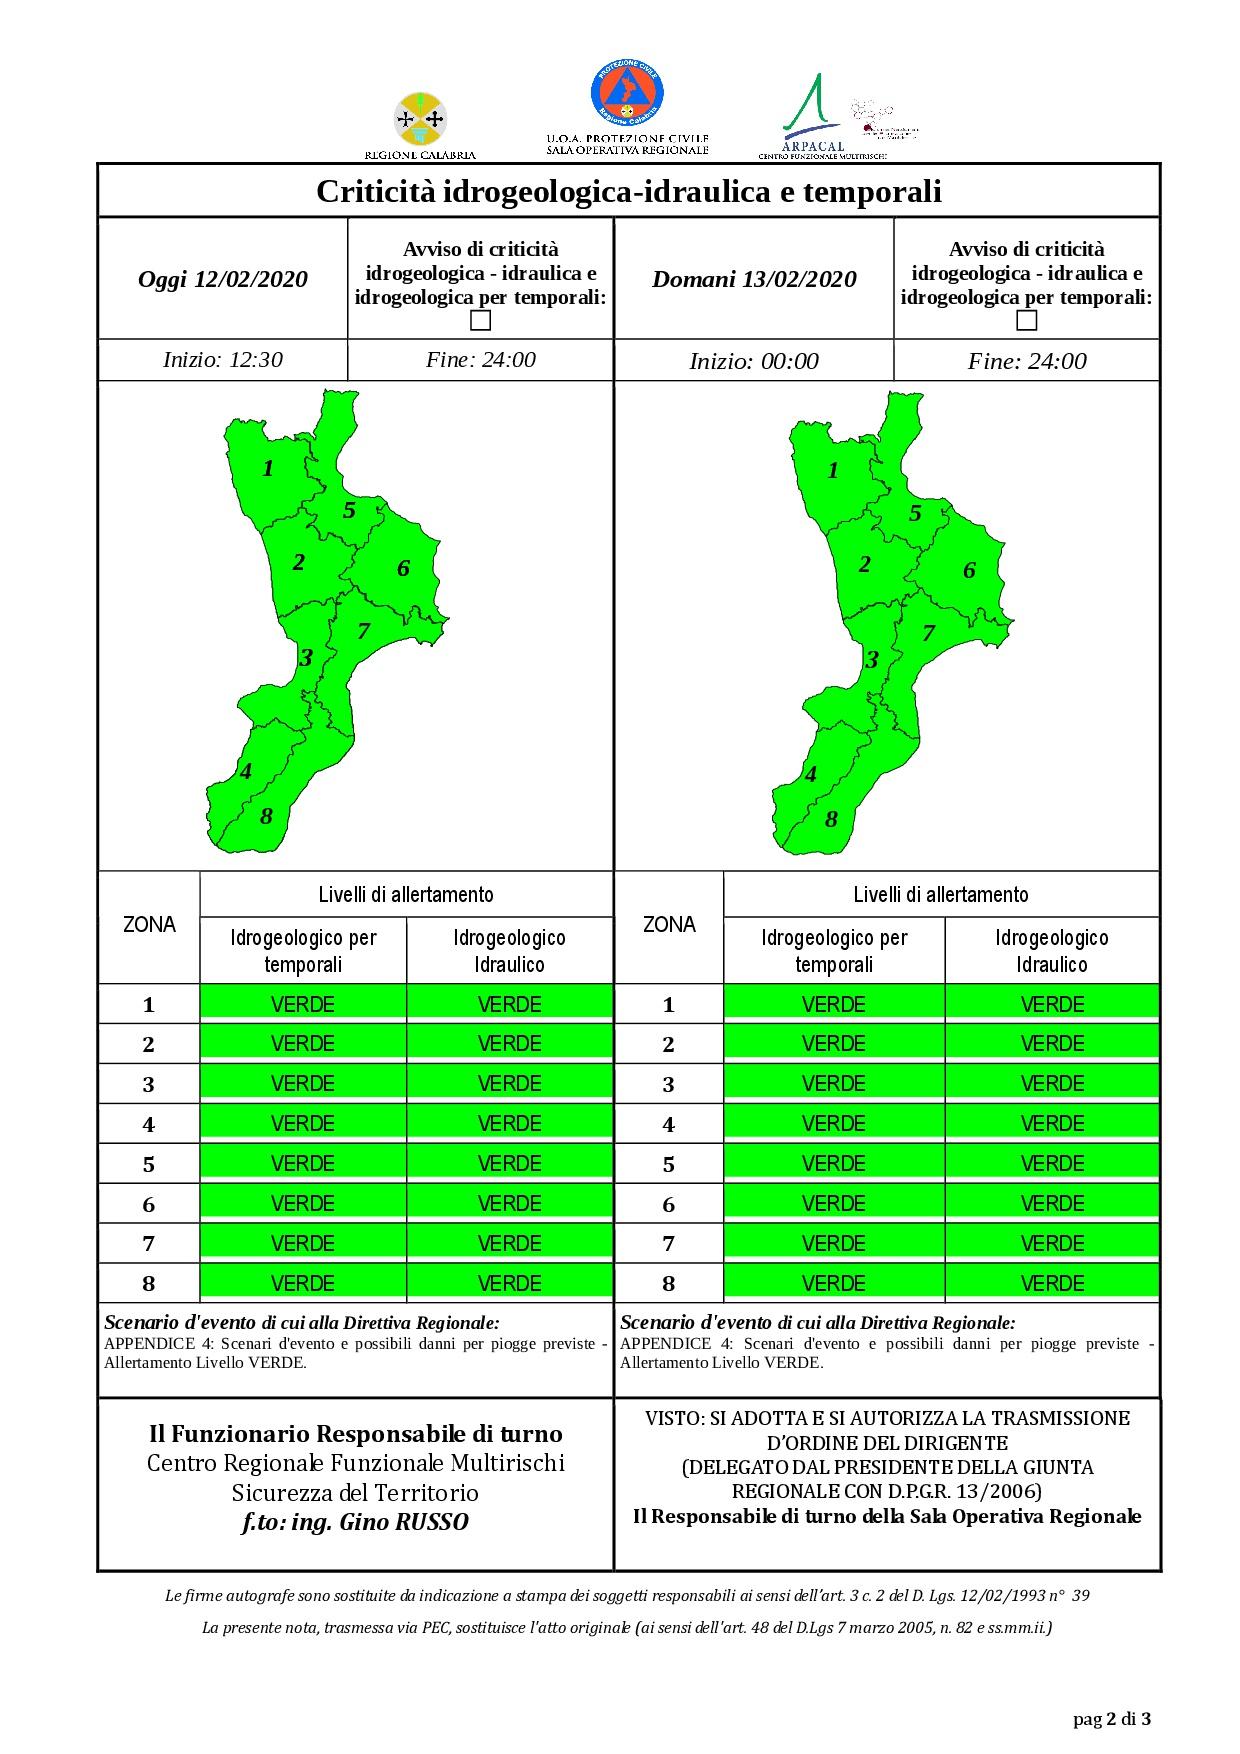 Criticità idrogeologica-idraulica e temporali in Calabria 12-02-2020